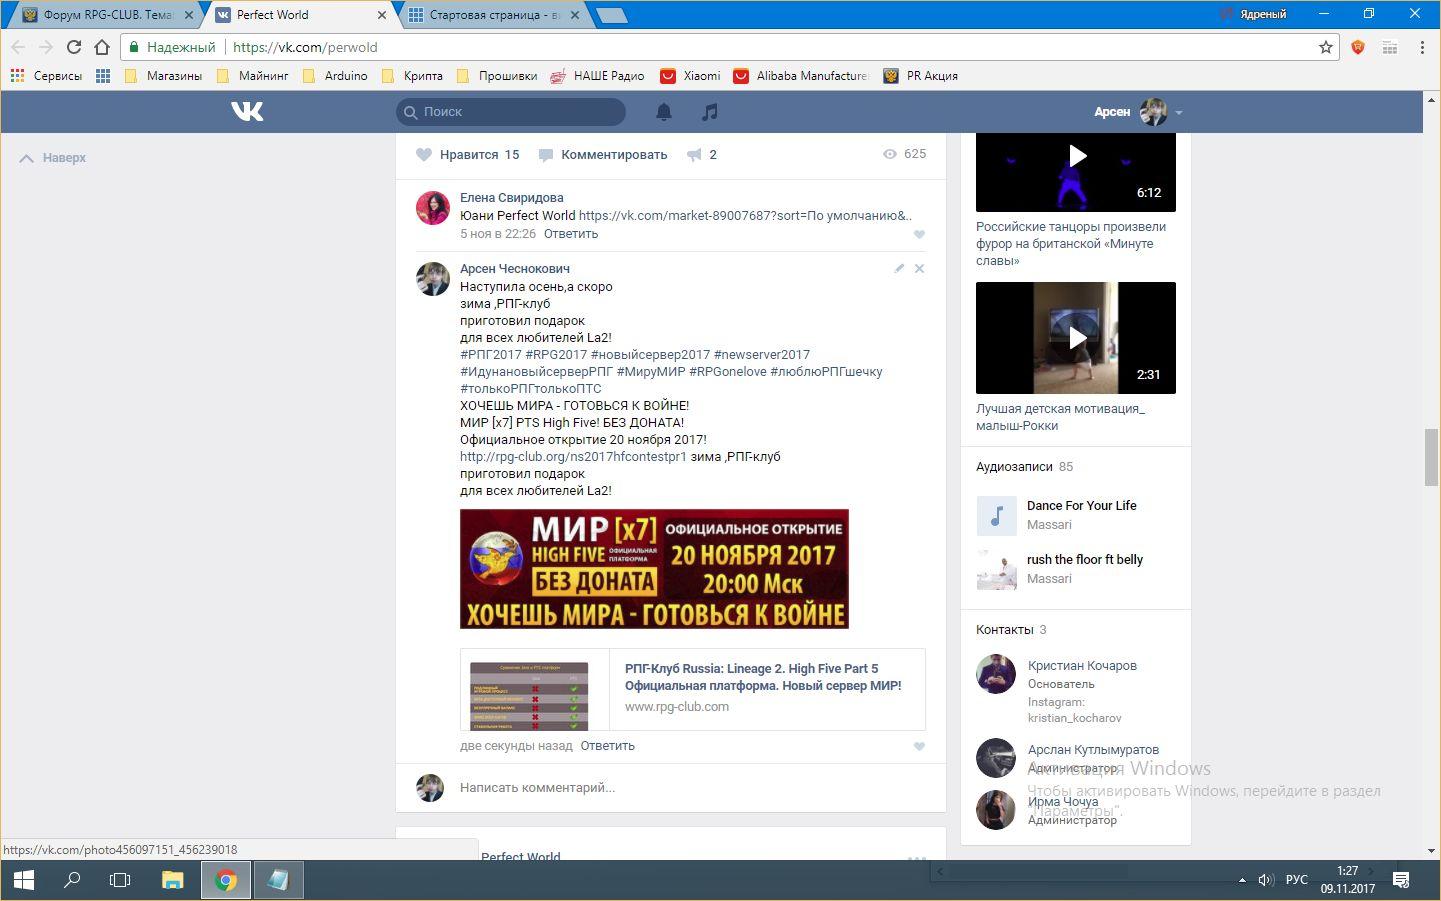 Lineage 2 Screenshot: Хроники серверов Lineage2 Л2